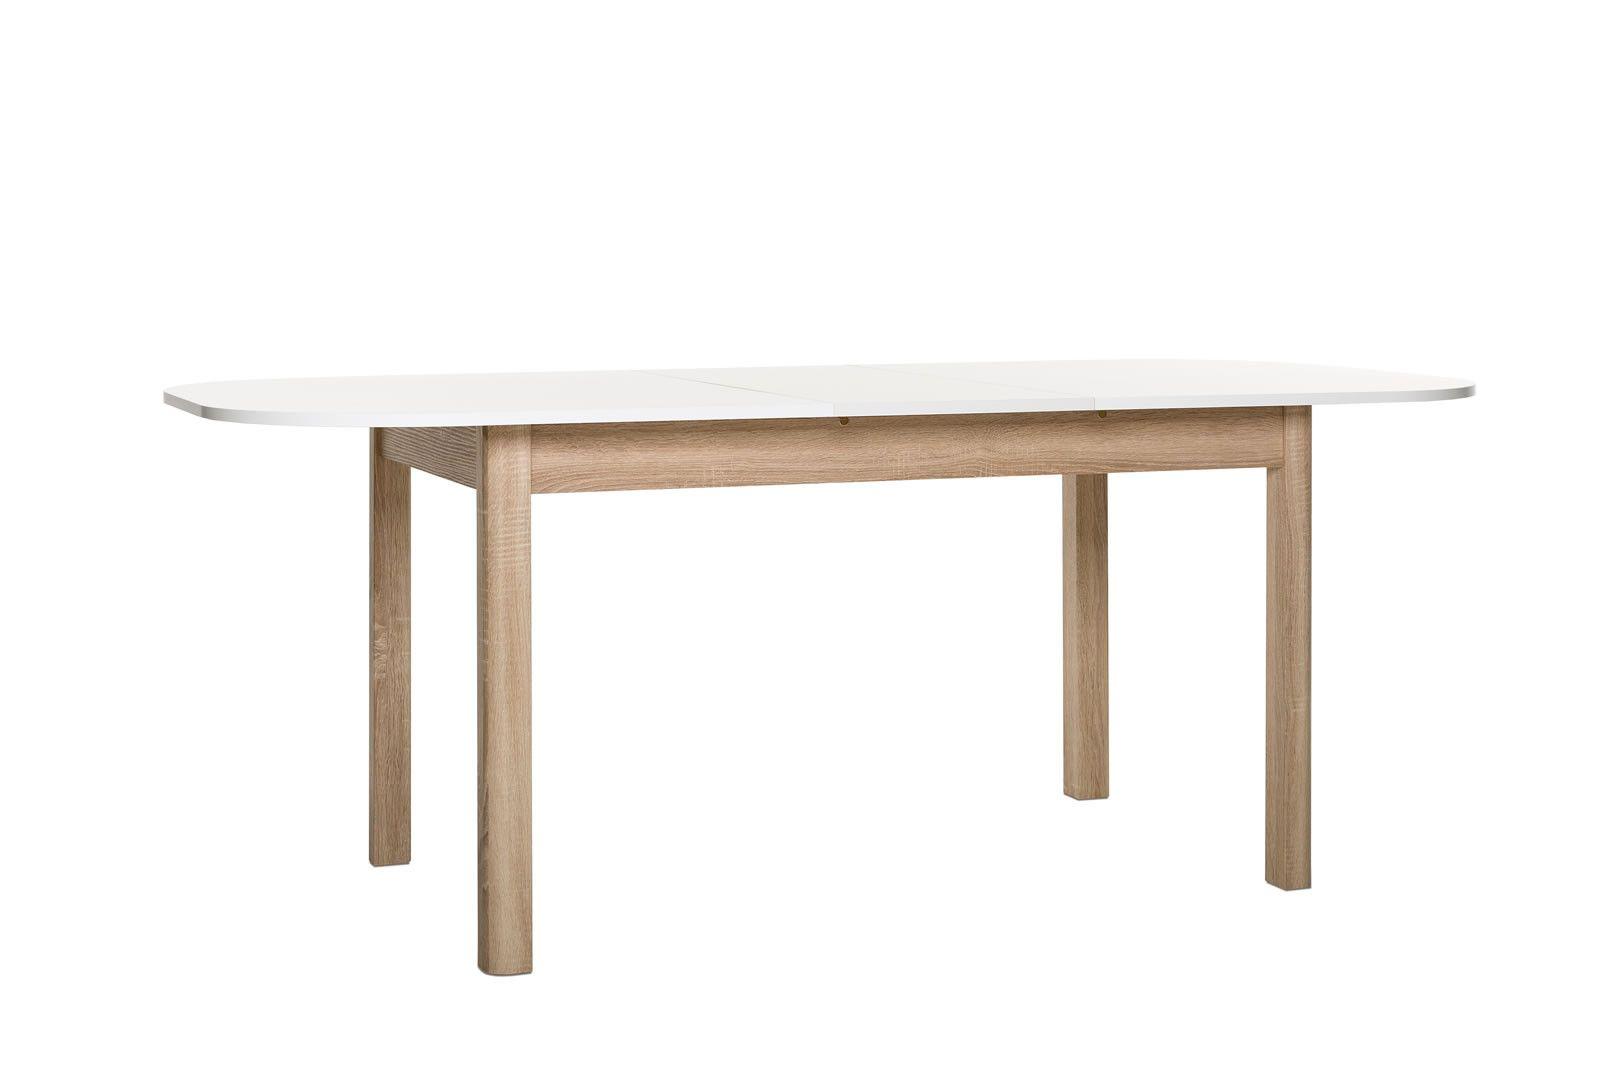 Made In Europe Table De Salle A Manger Ou Cuisne Extensible Bois Et Blanc Lounge